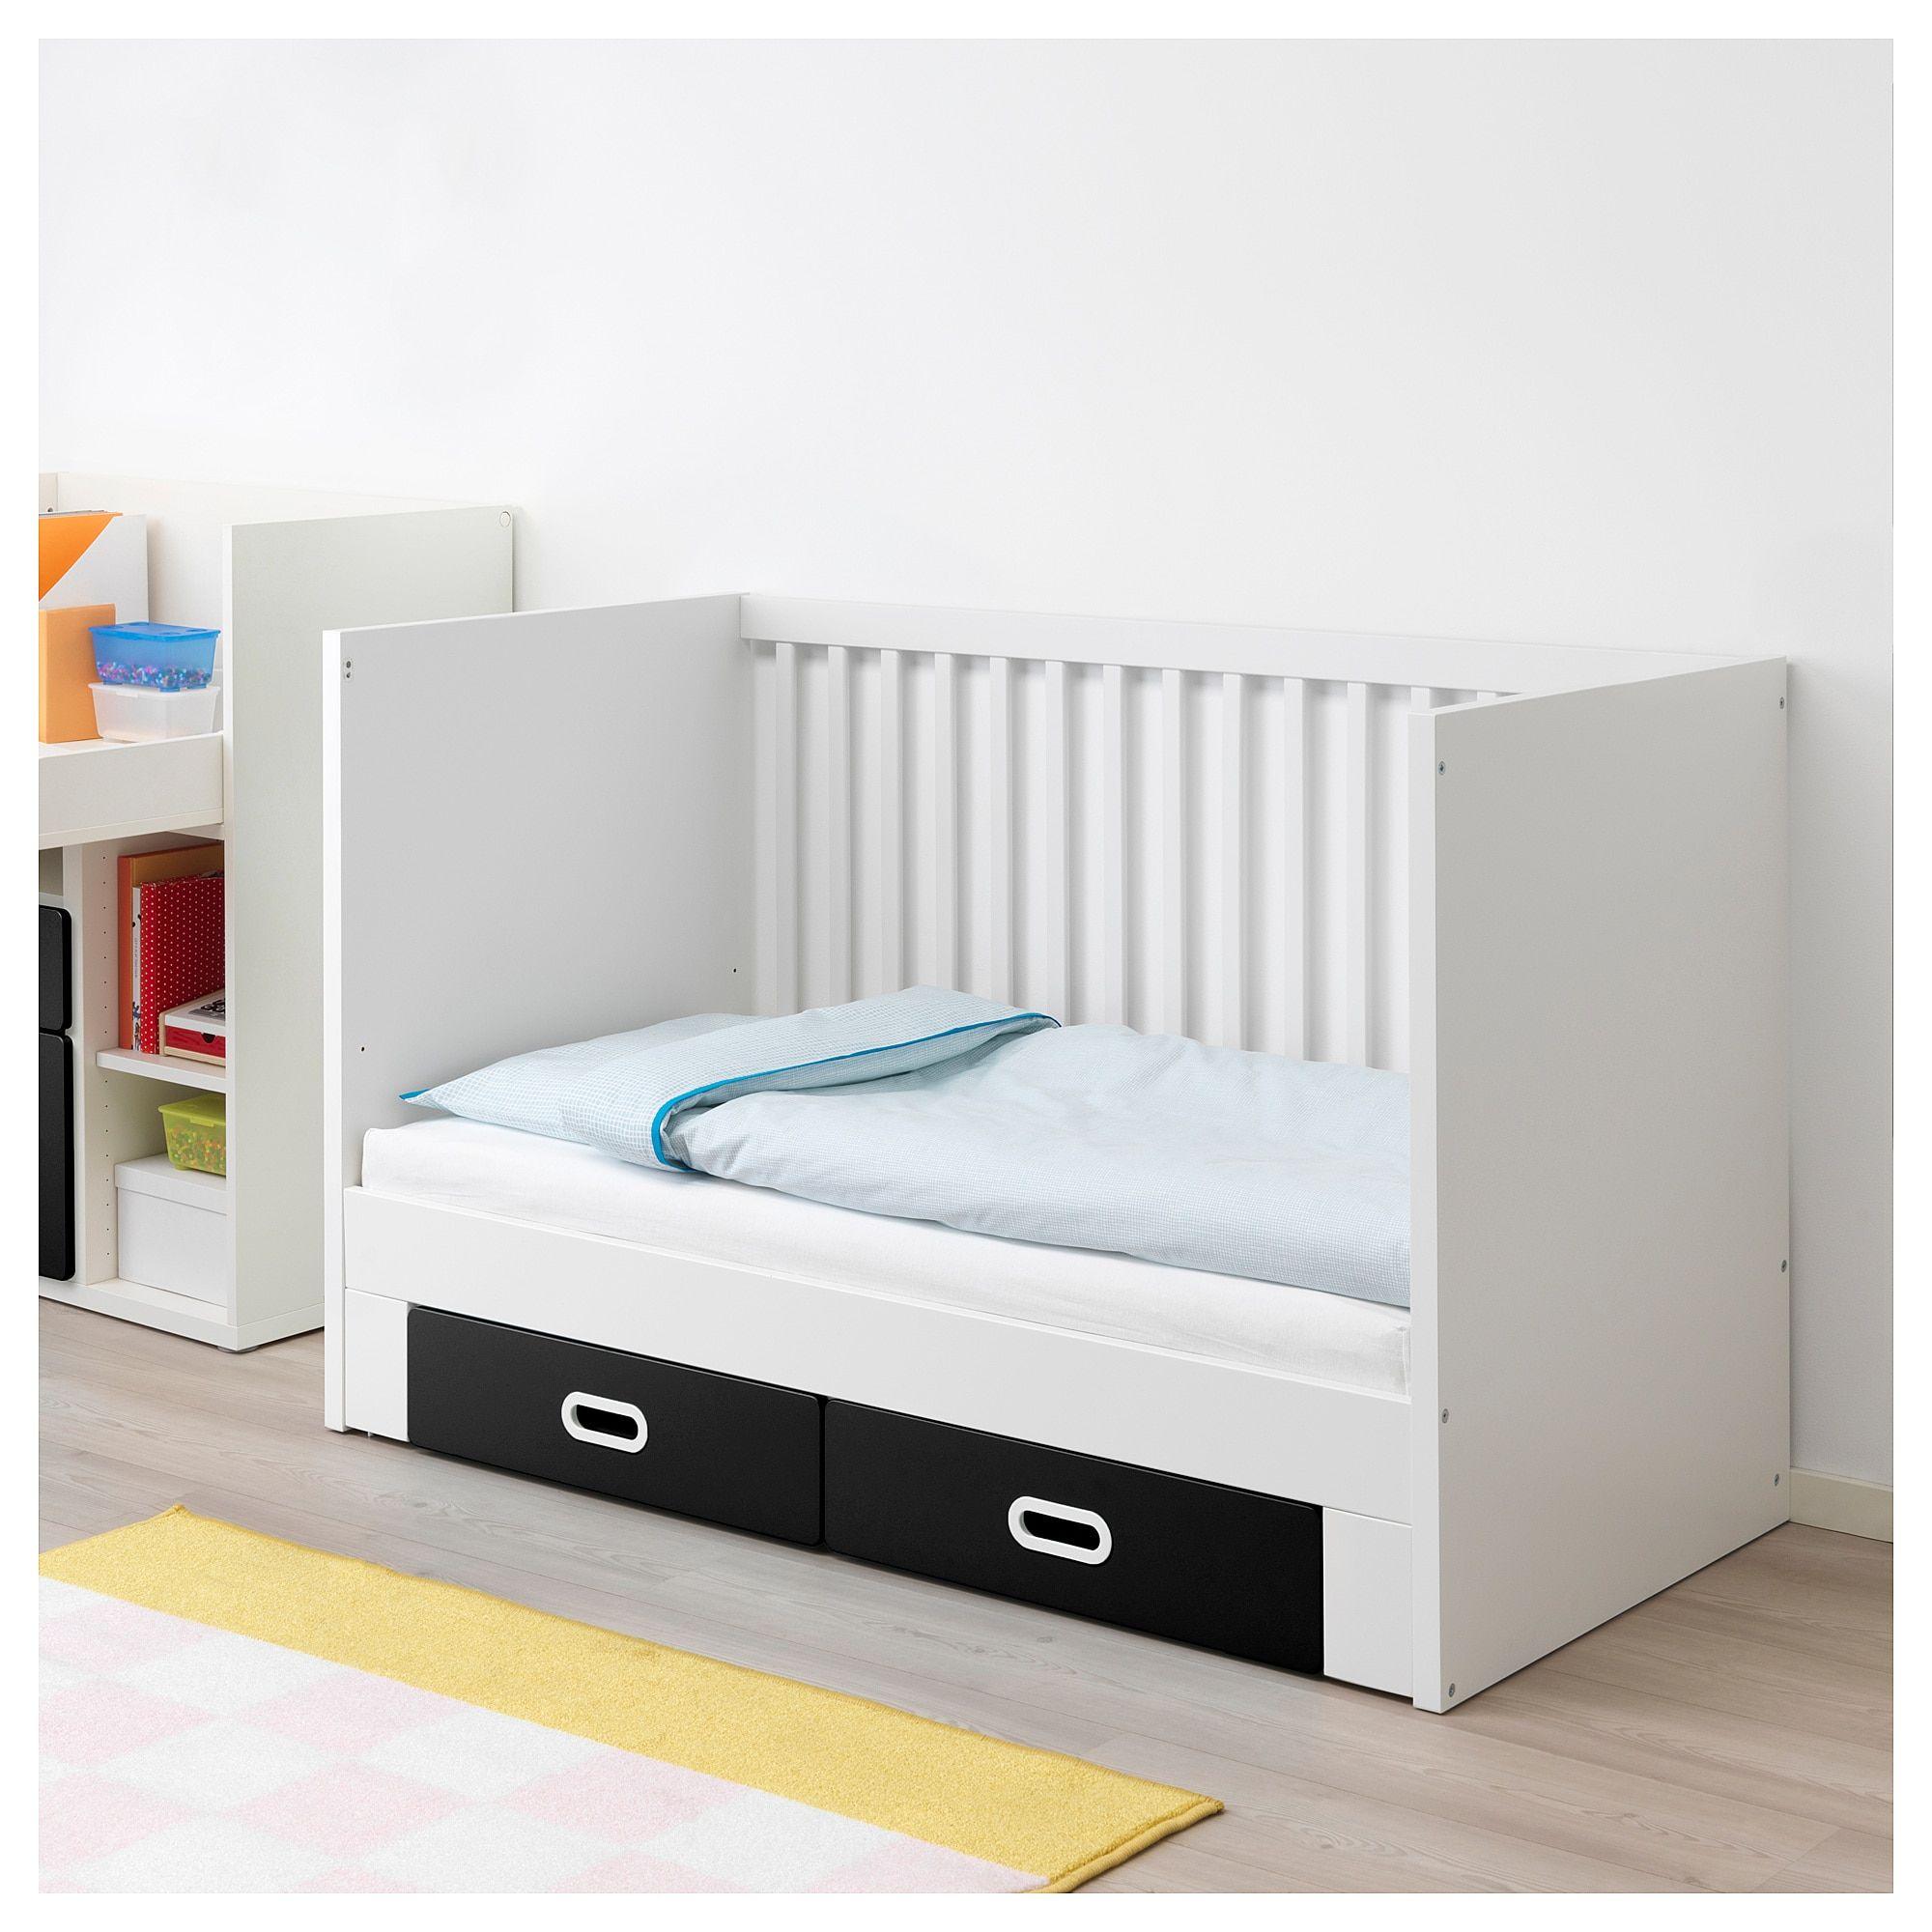 Ikea Babybett Als Beistellbett